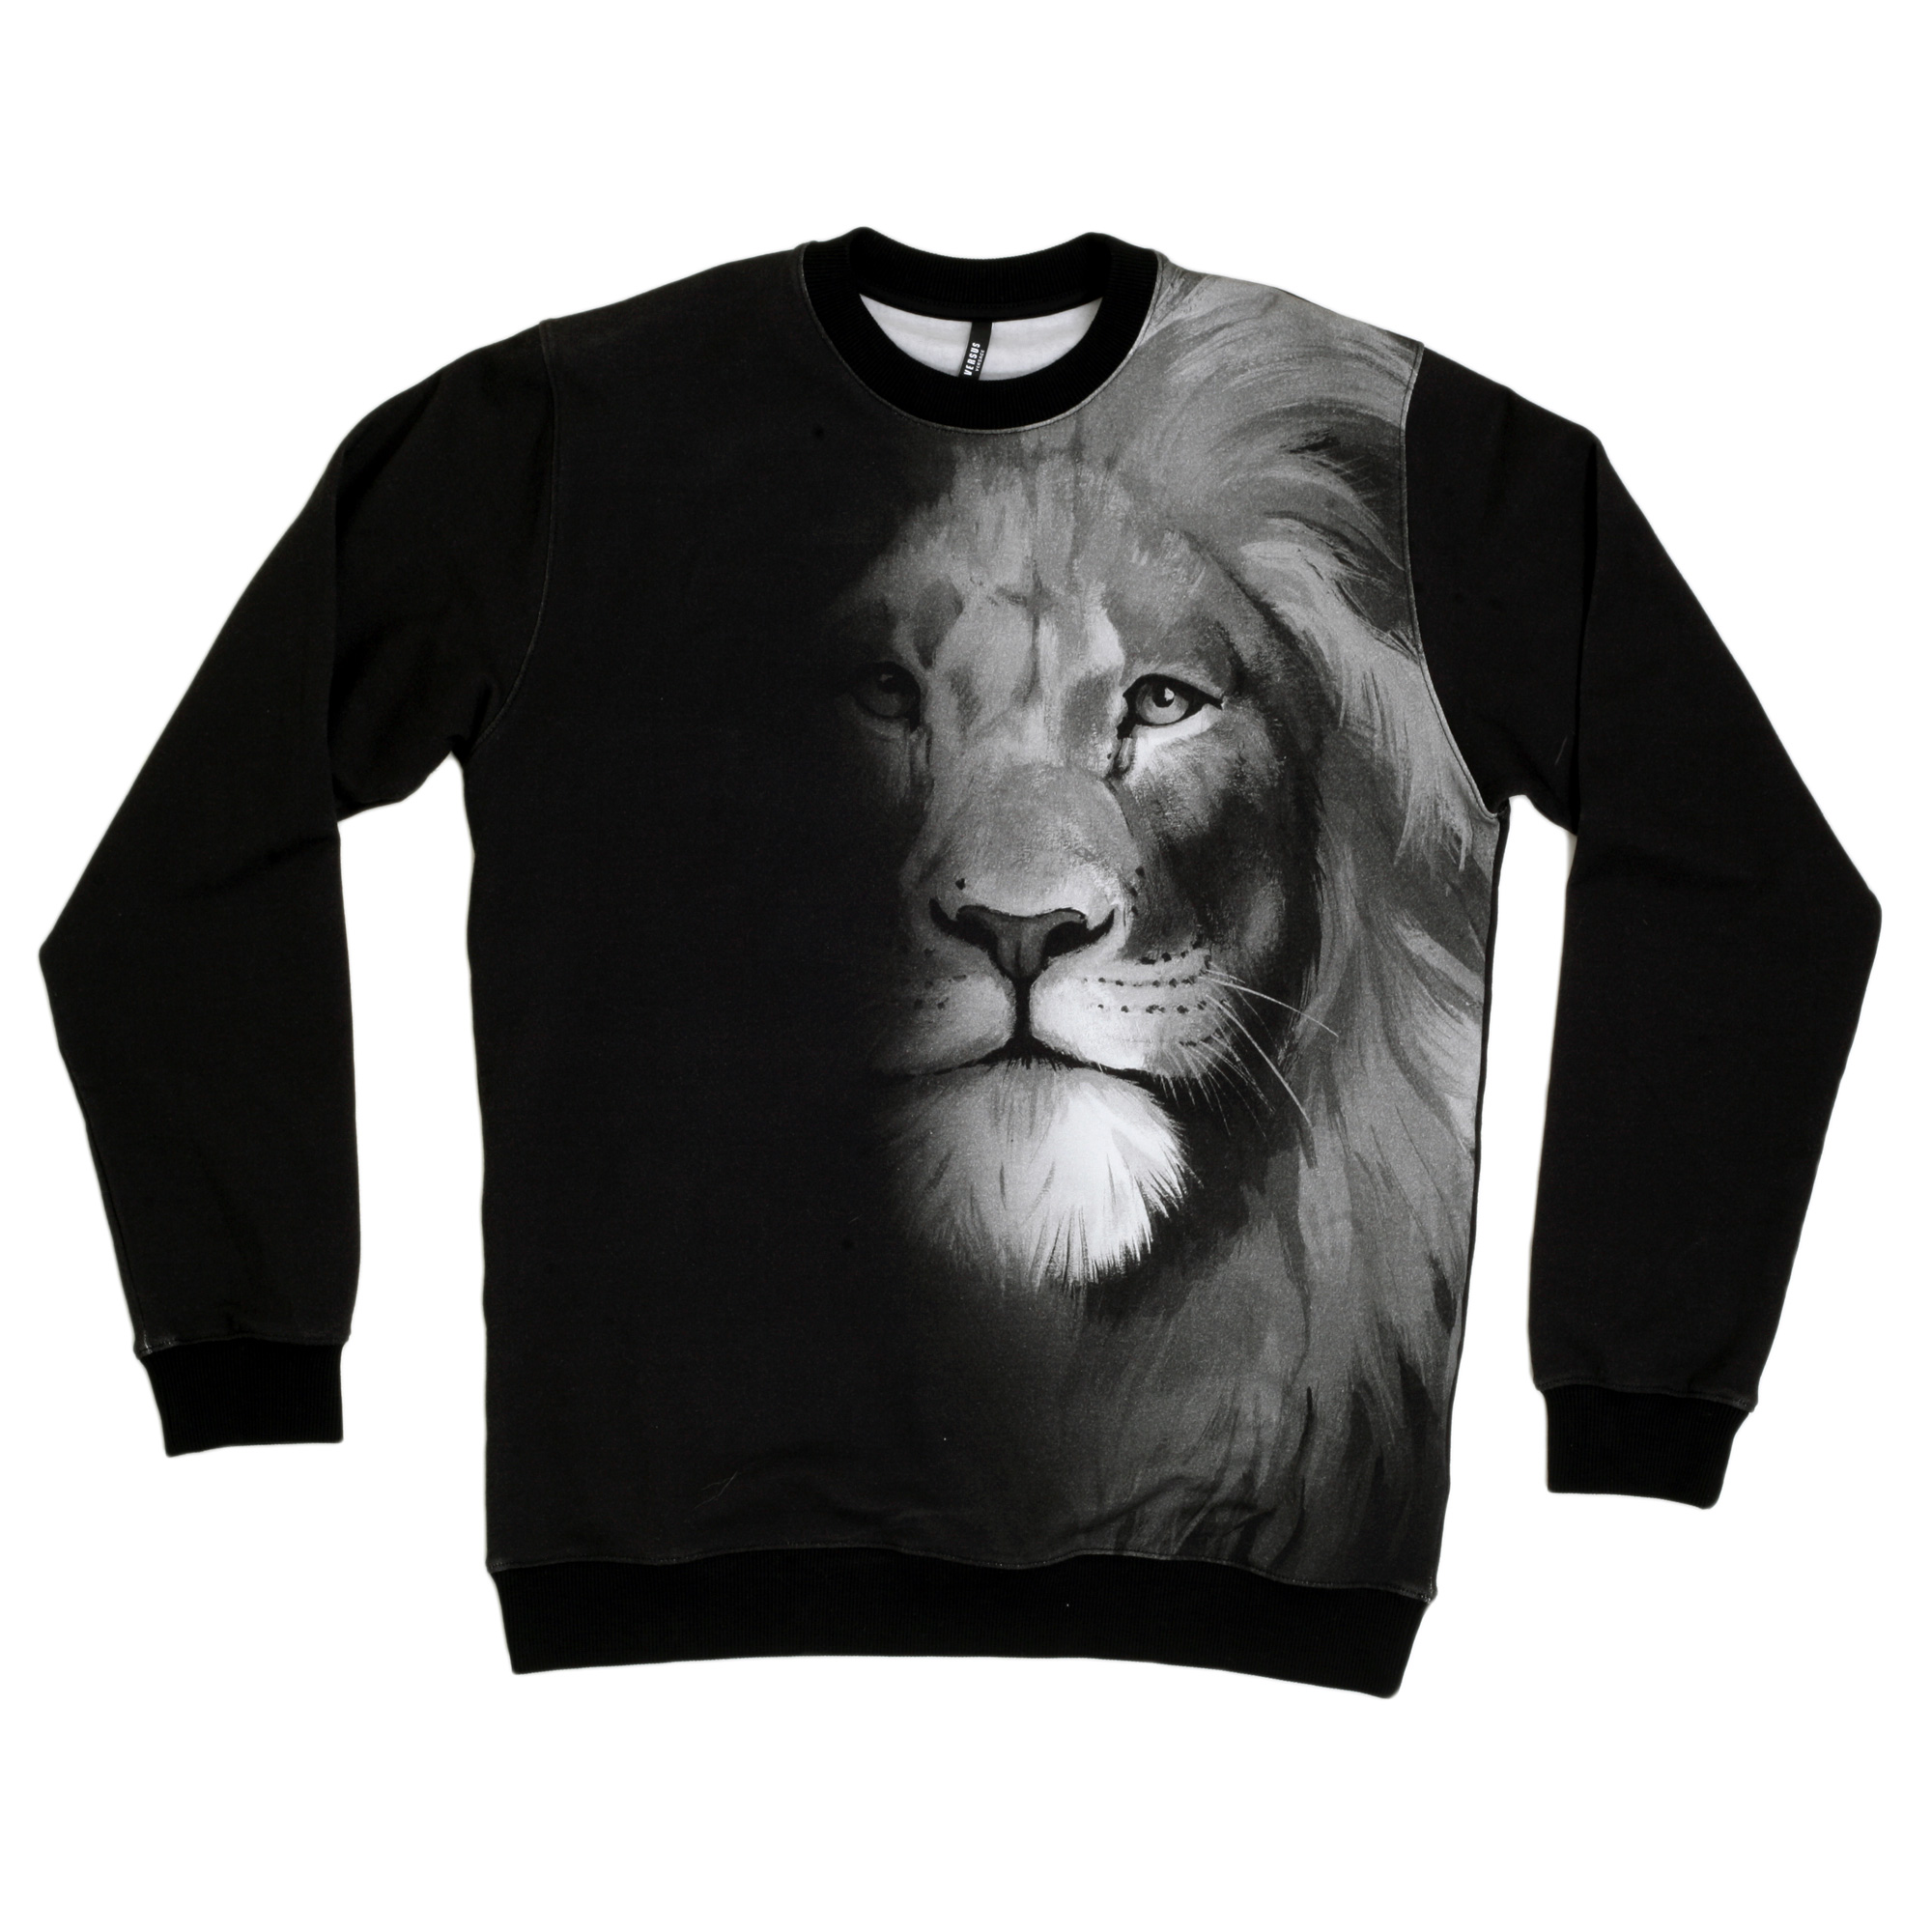 Mens Versace sweatshirts